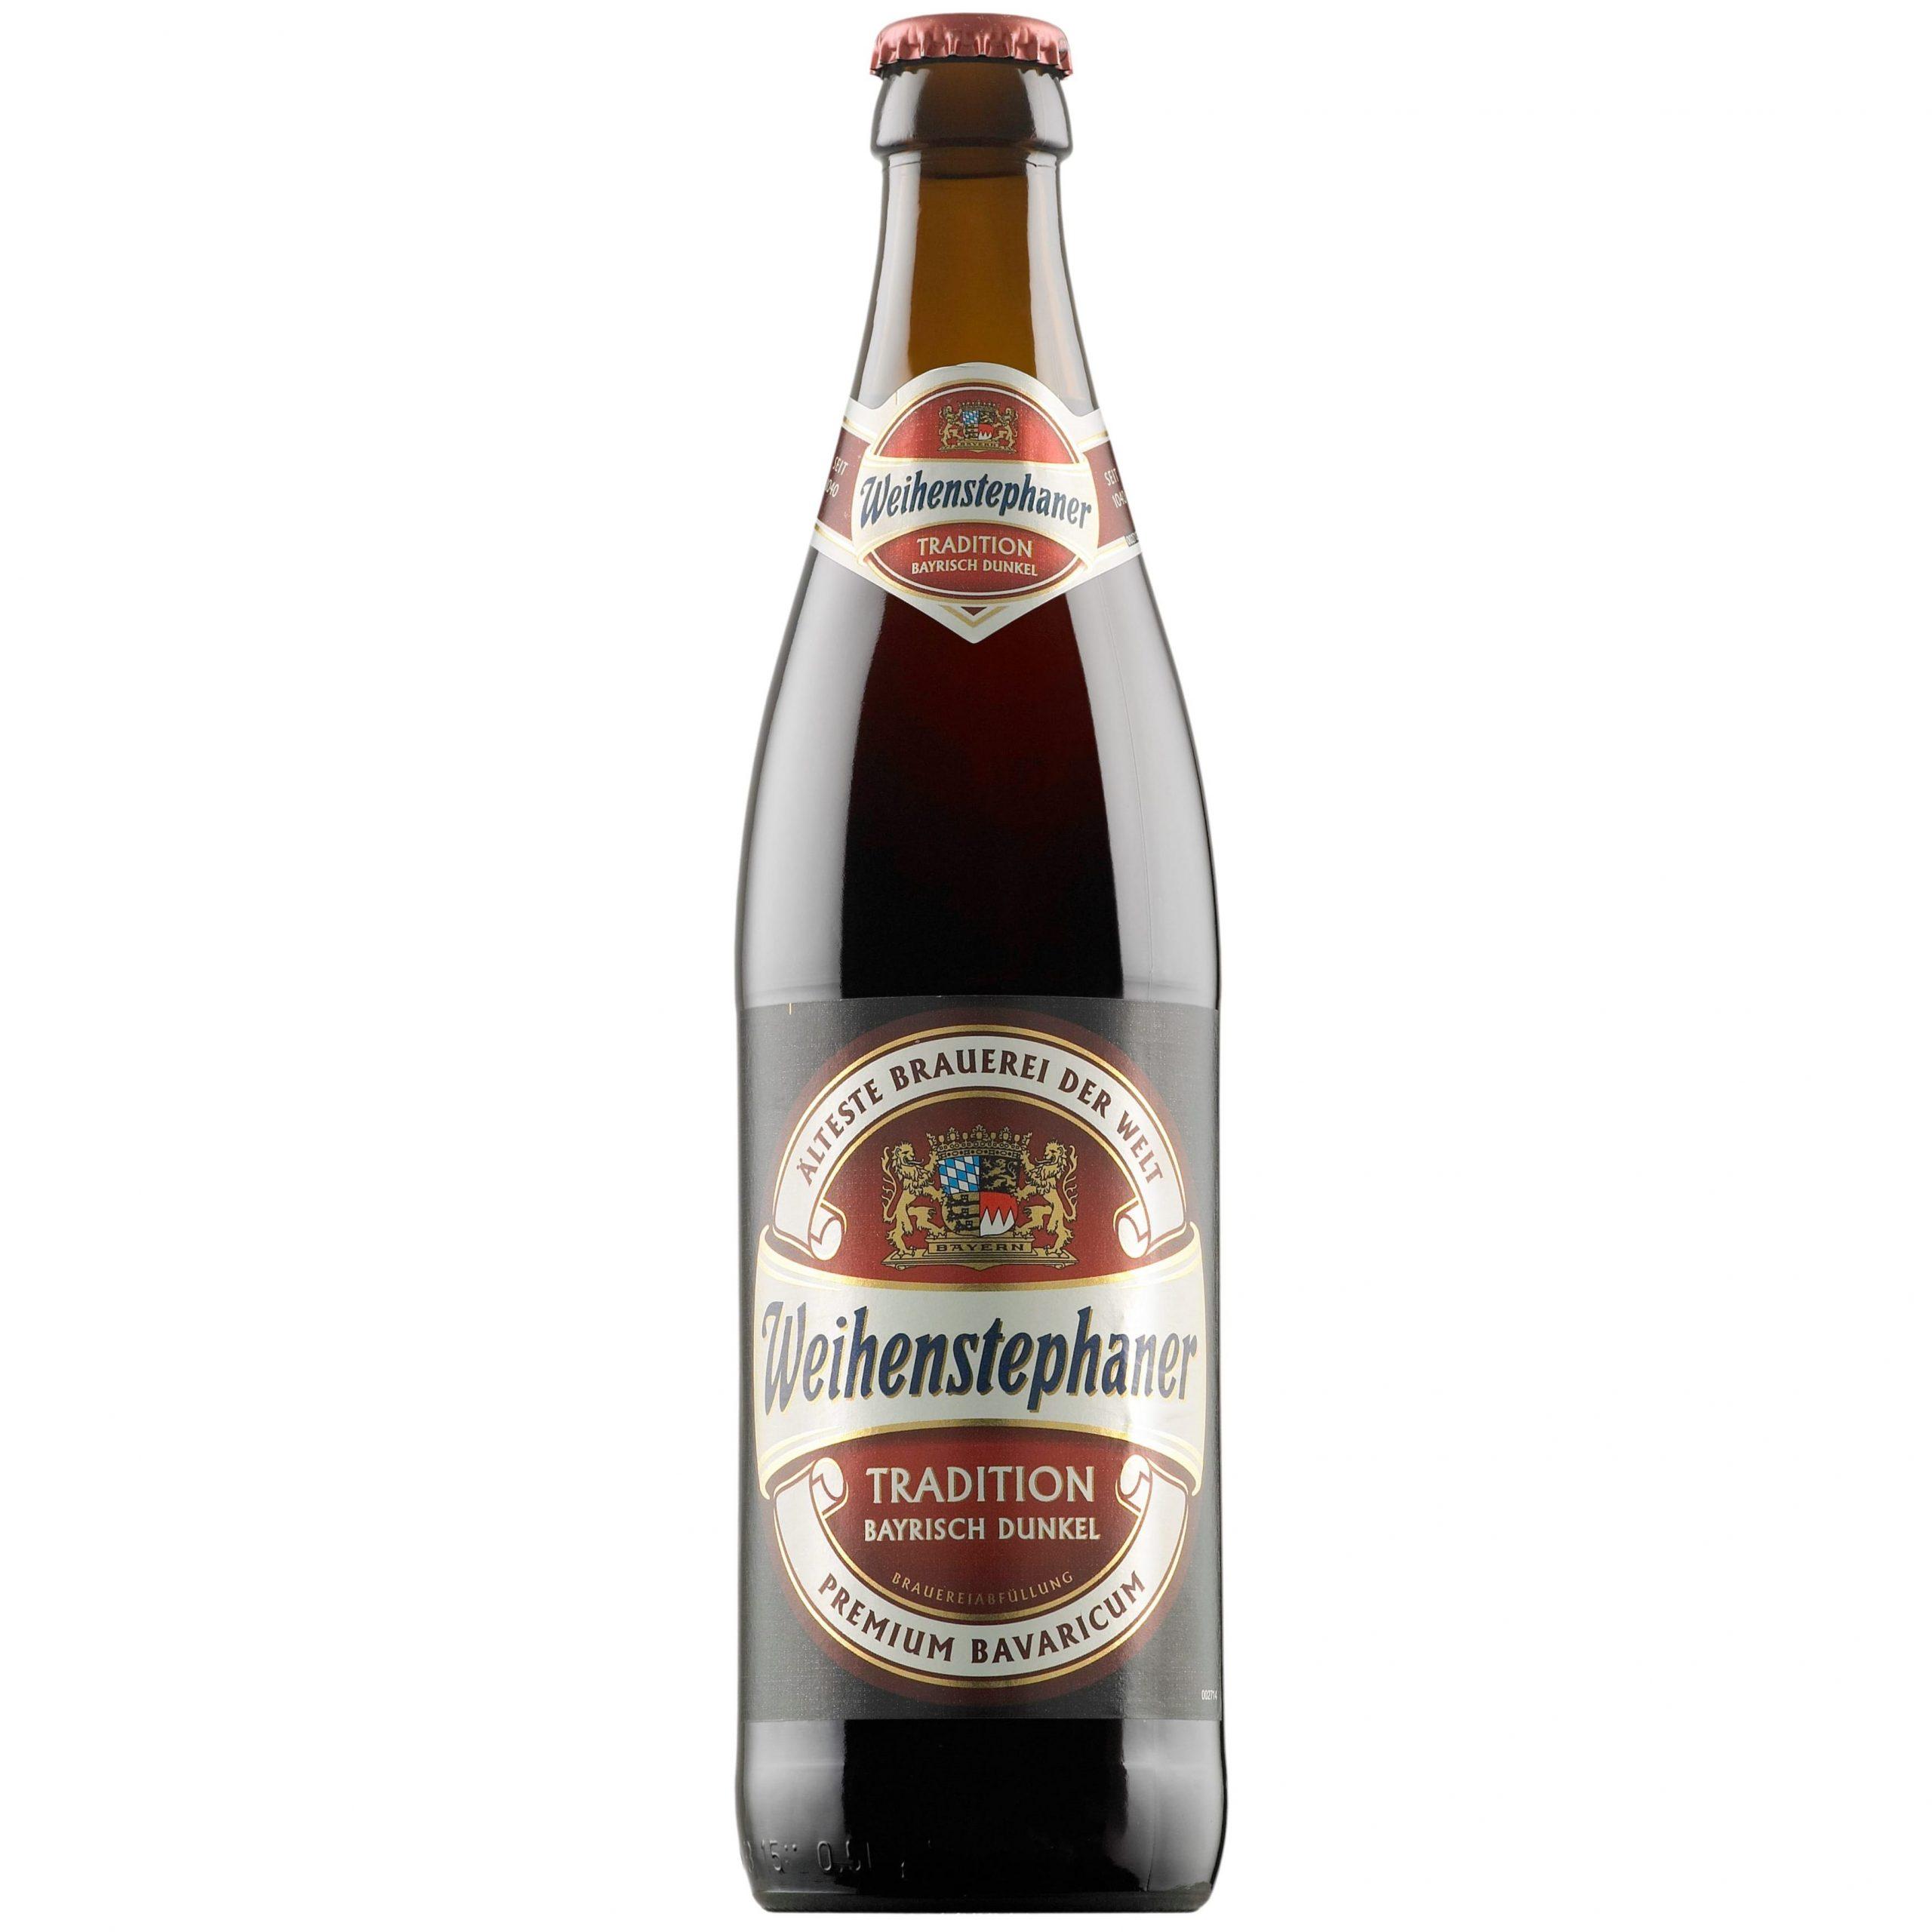 Weihenstephaner - Tradition 50cl